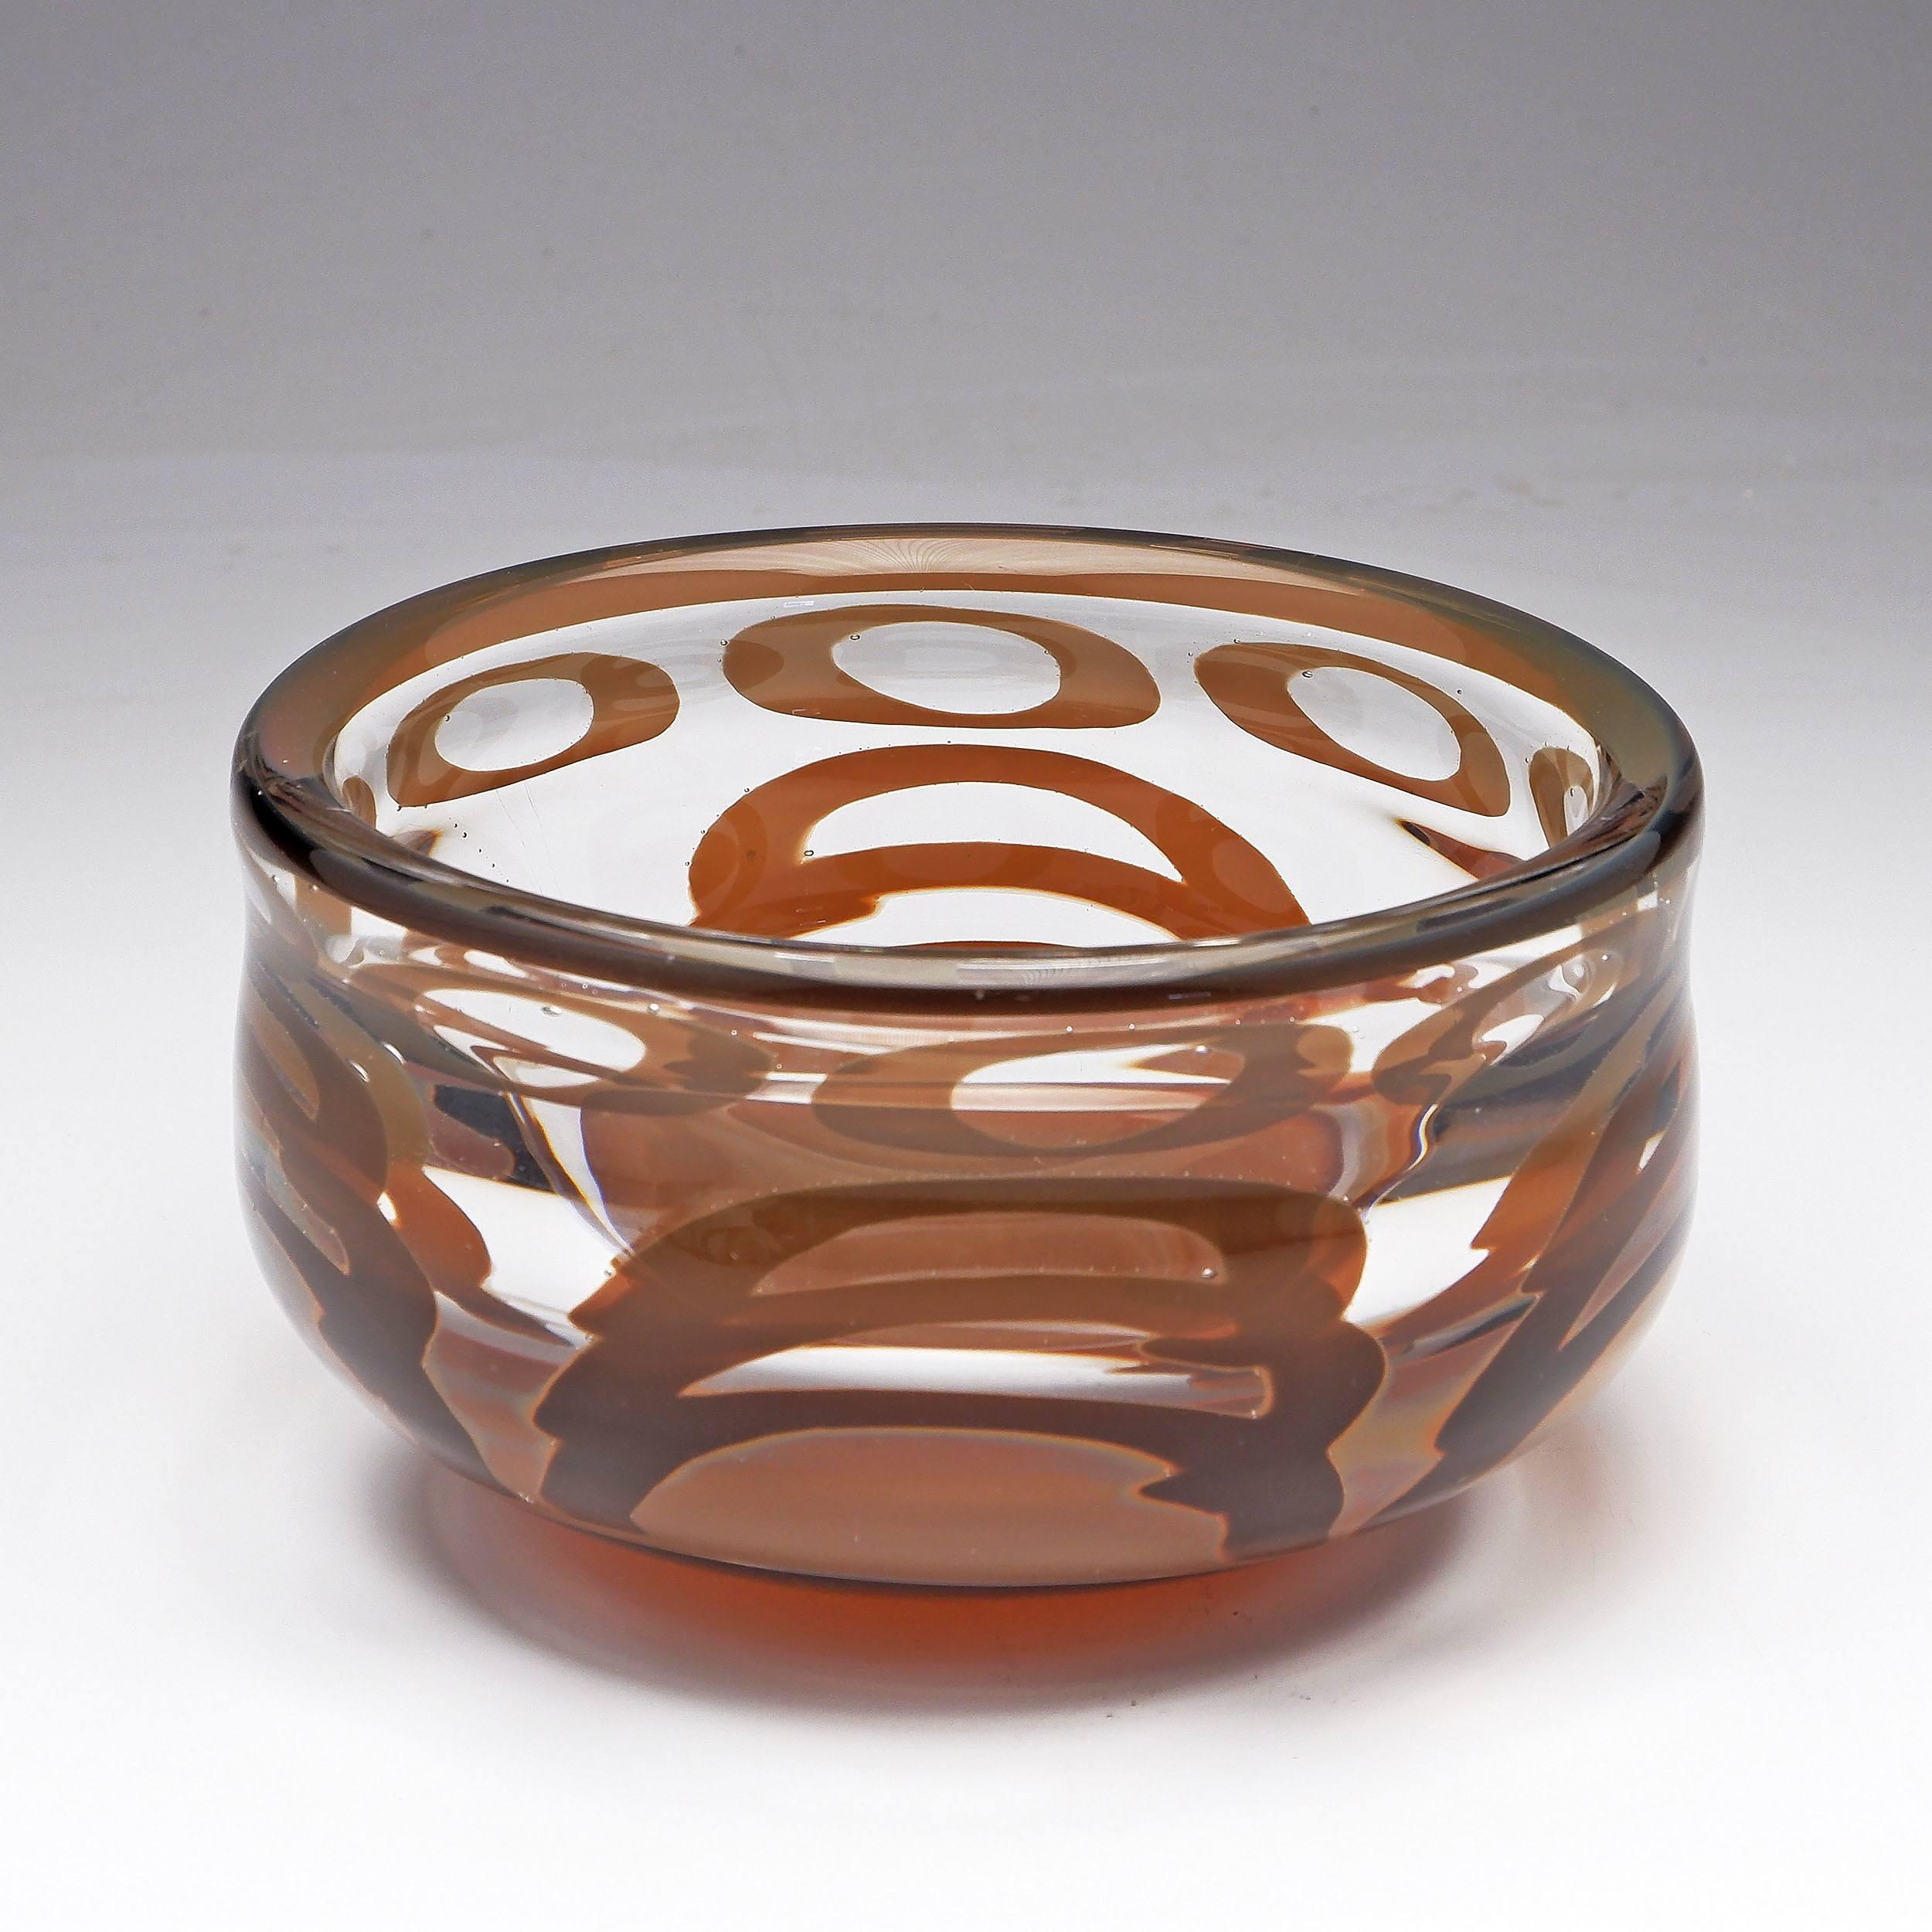 'Orrefors Graal Vase of Large Proportion Circa 1970s by Ingeborg Lundin'